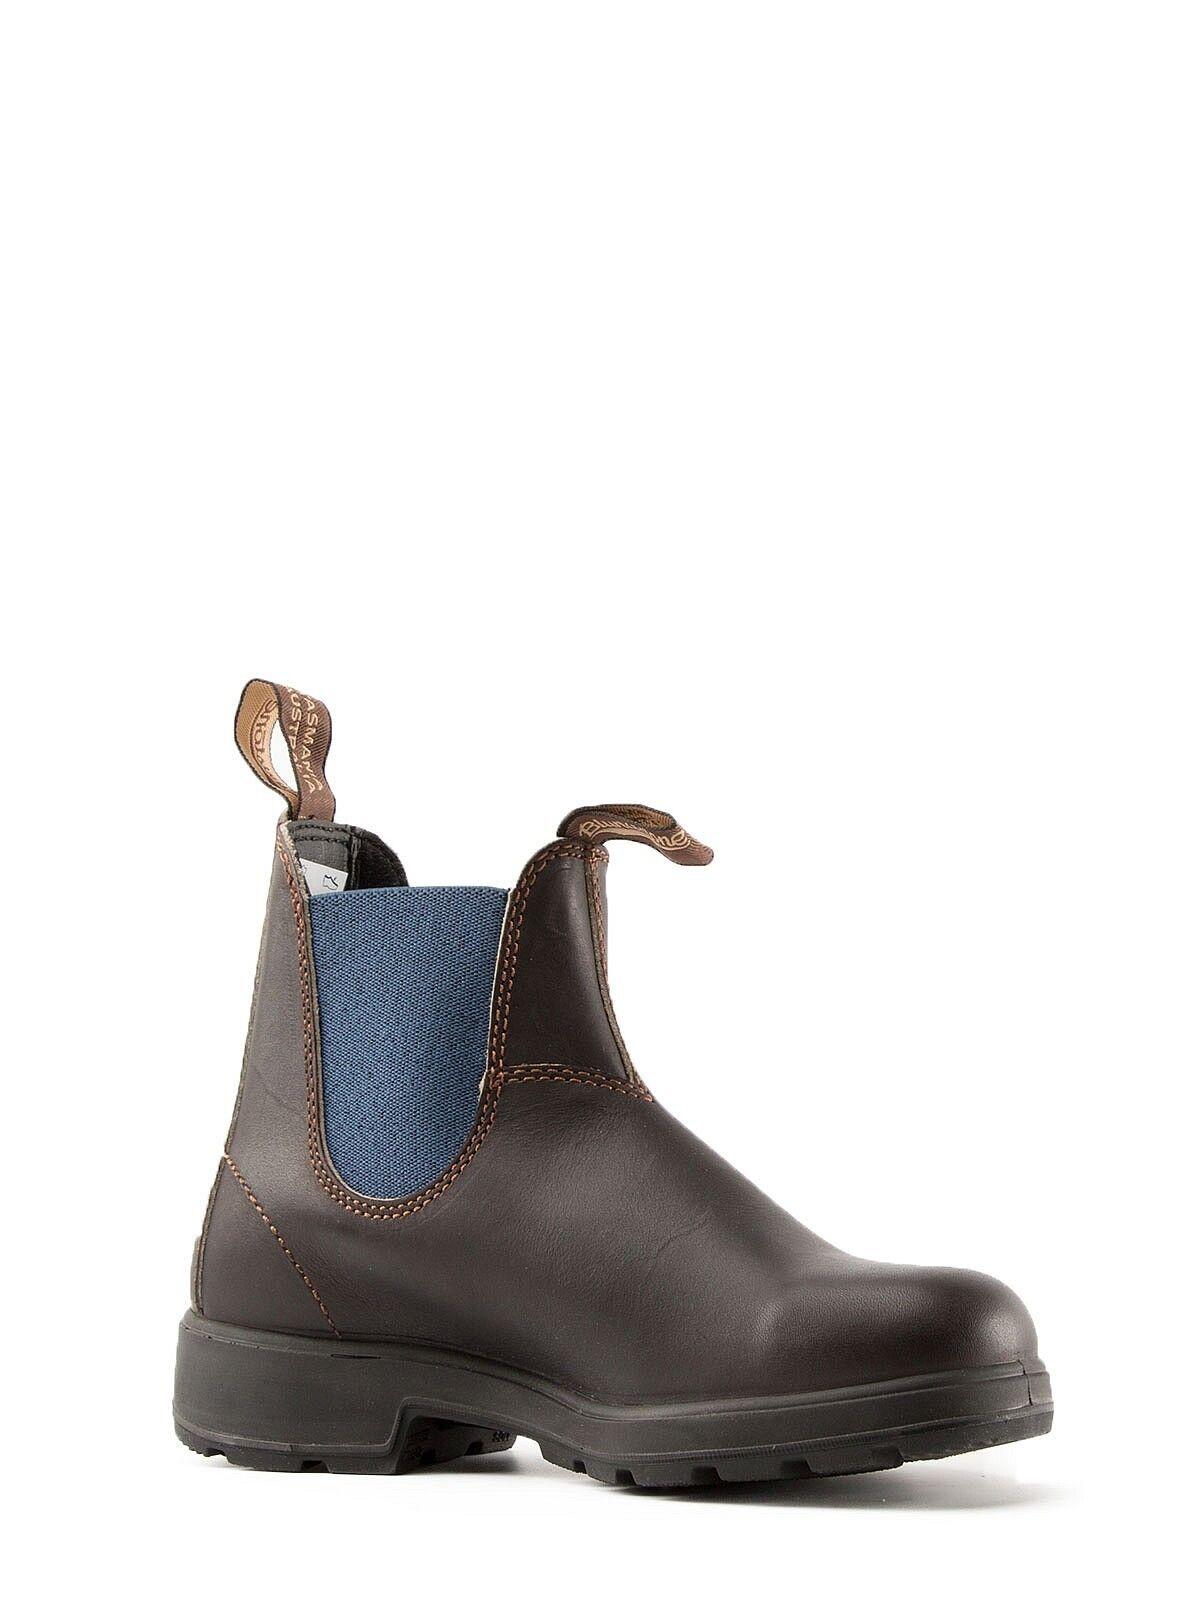 blueNDSTONE AUSTRALIA shoes STIVALETTI  PELLE men brown blue